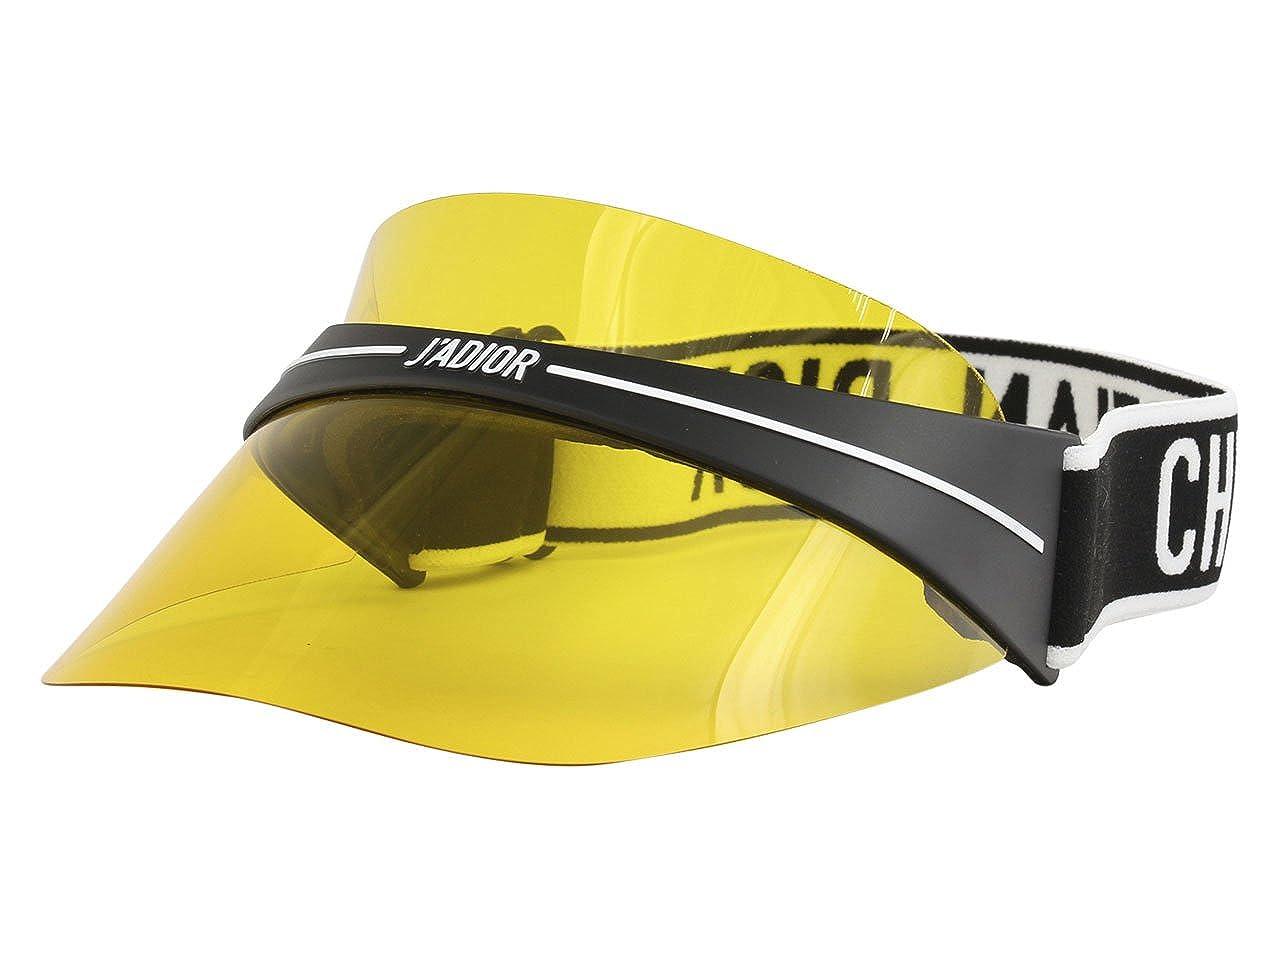 f55943662d Dior DIORCLUB1 Visor Black White/Yellow one Size fits All Unisex Sunglasses